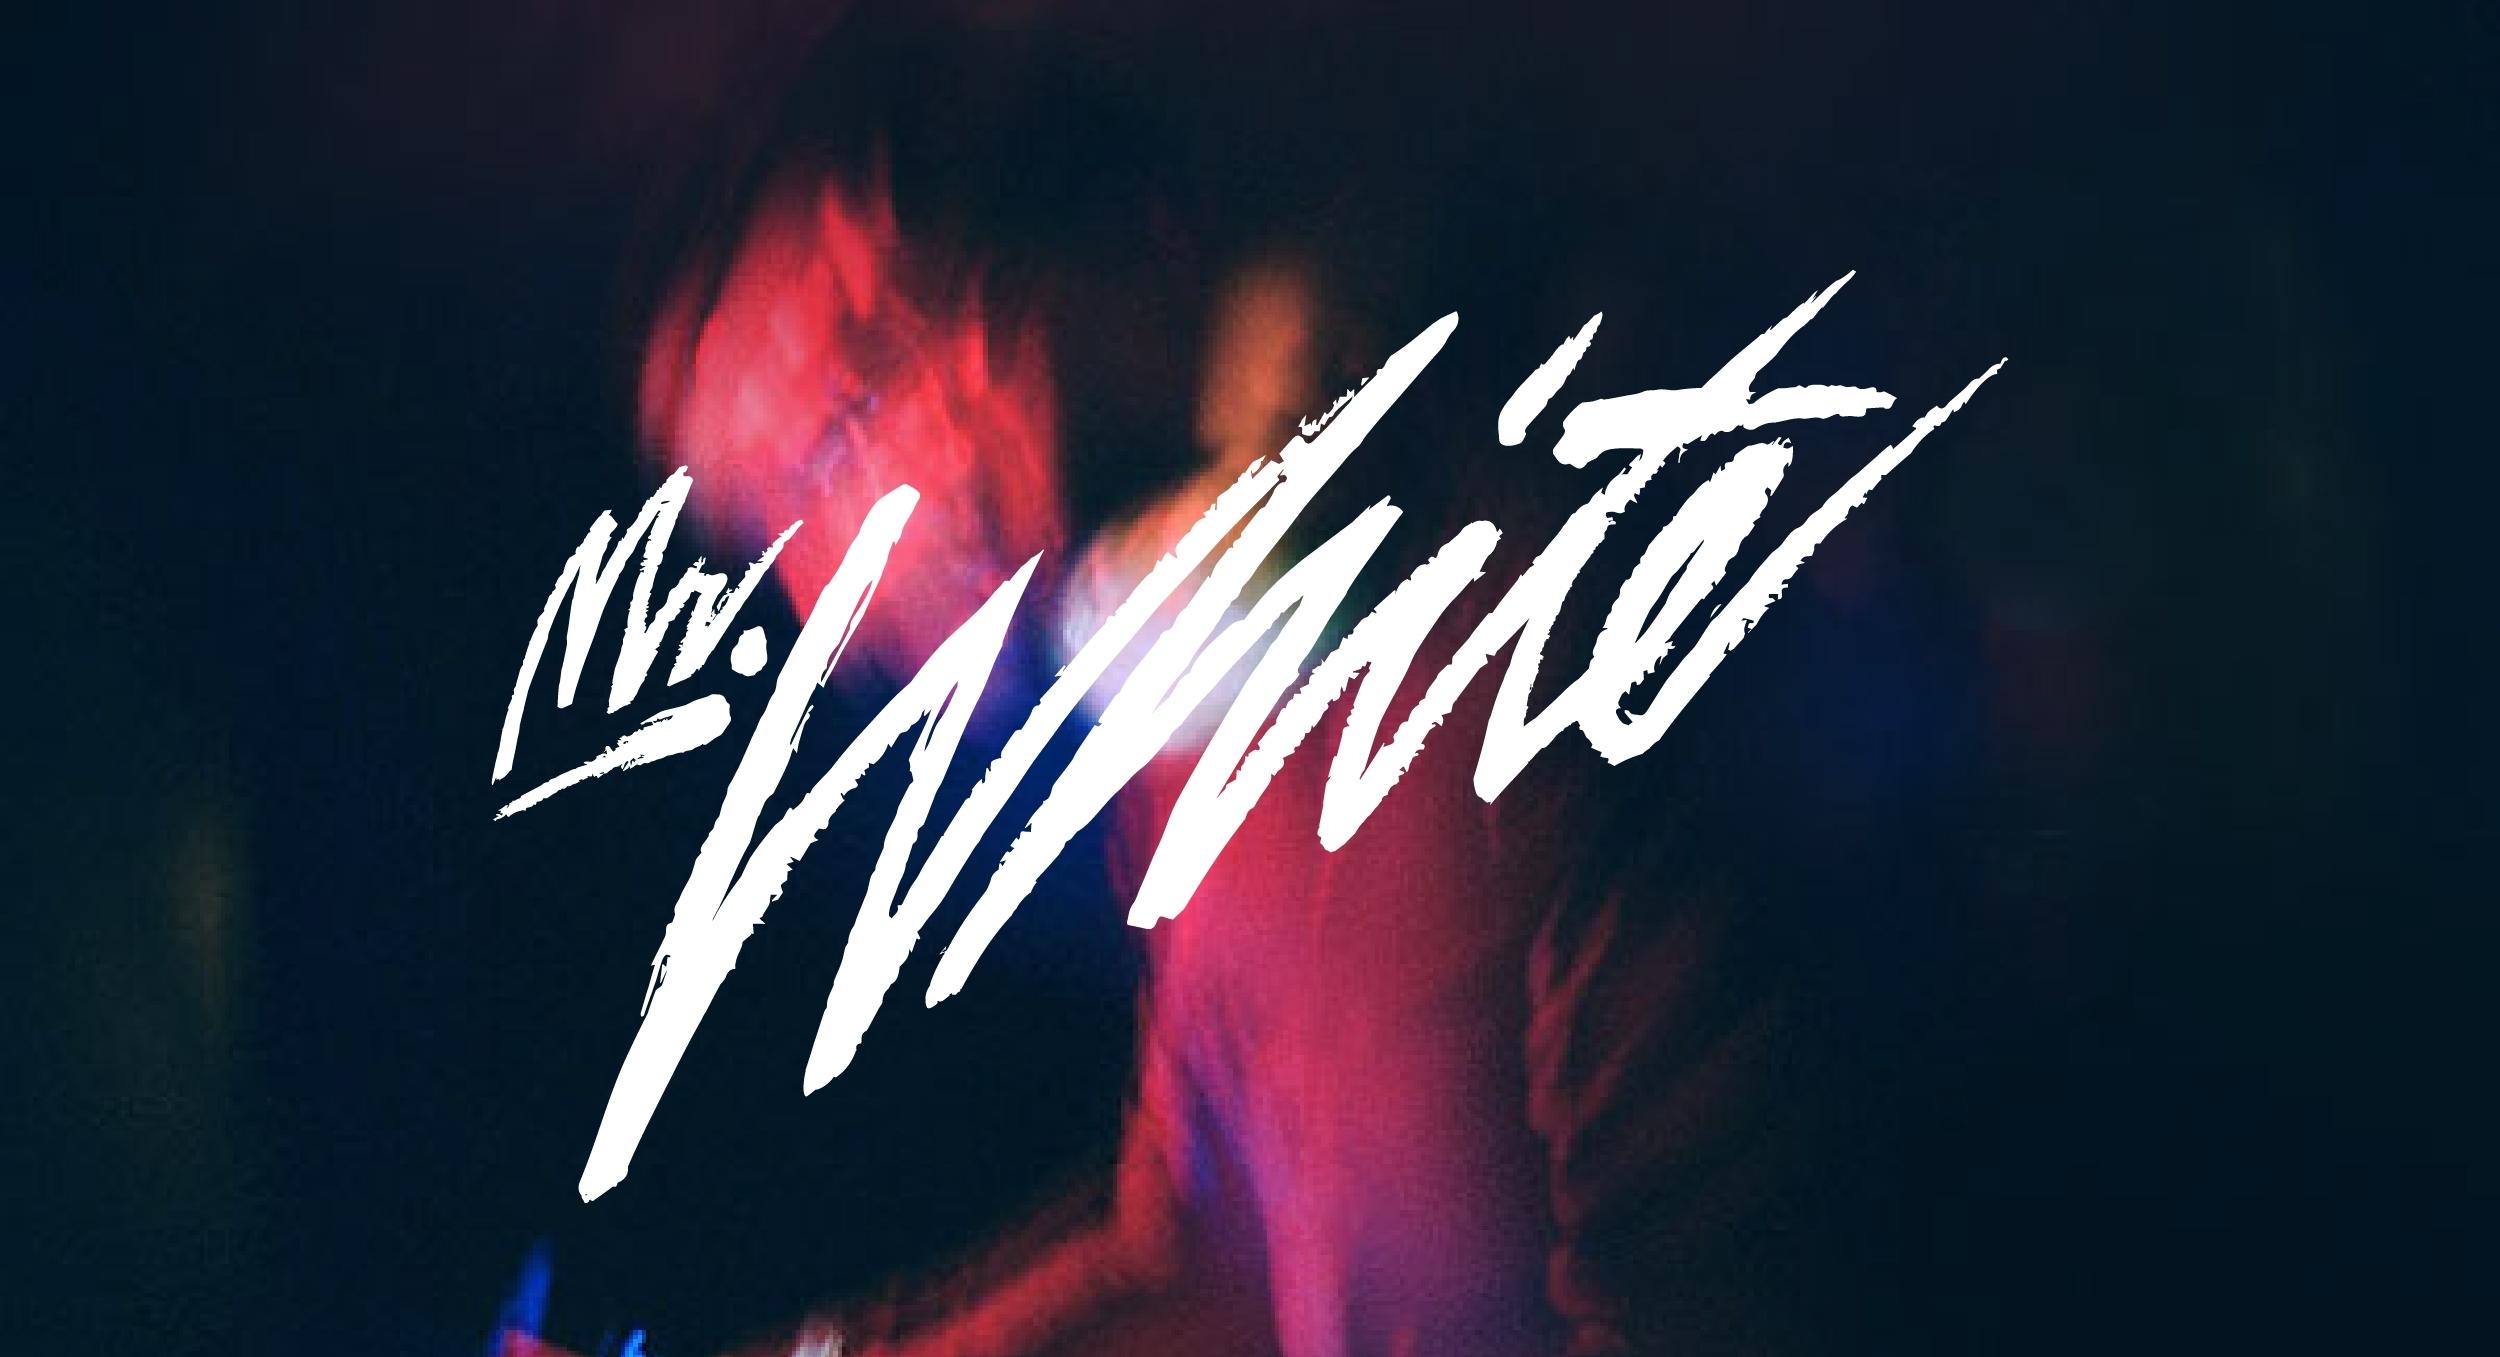 Mr. White - Music Production